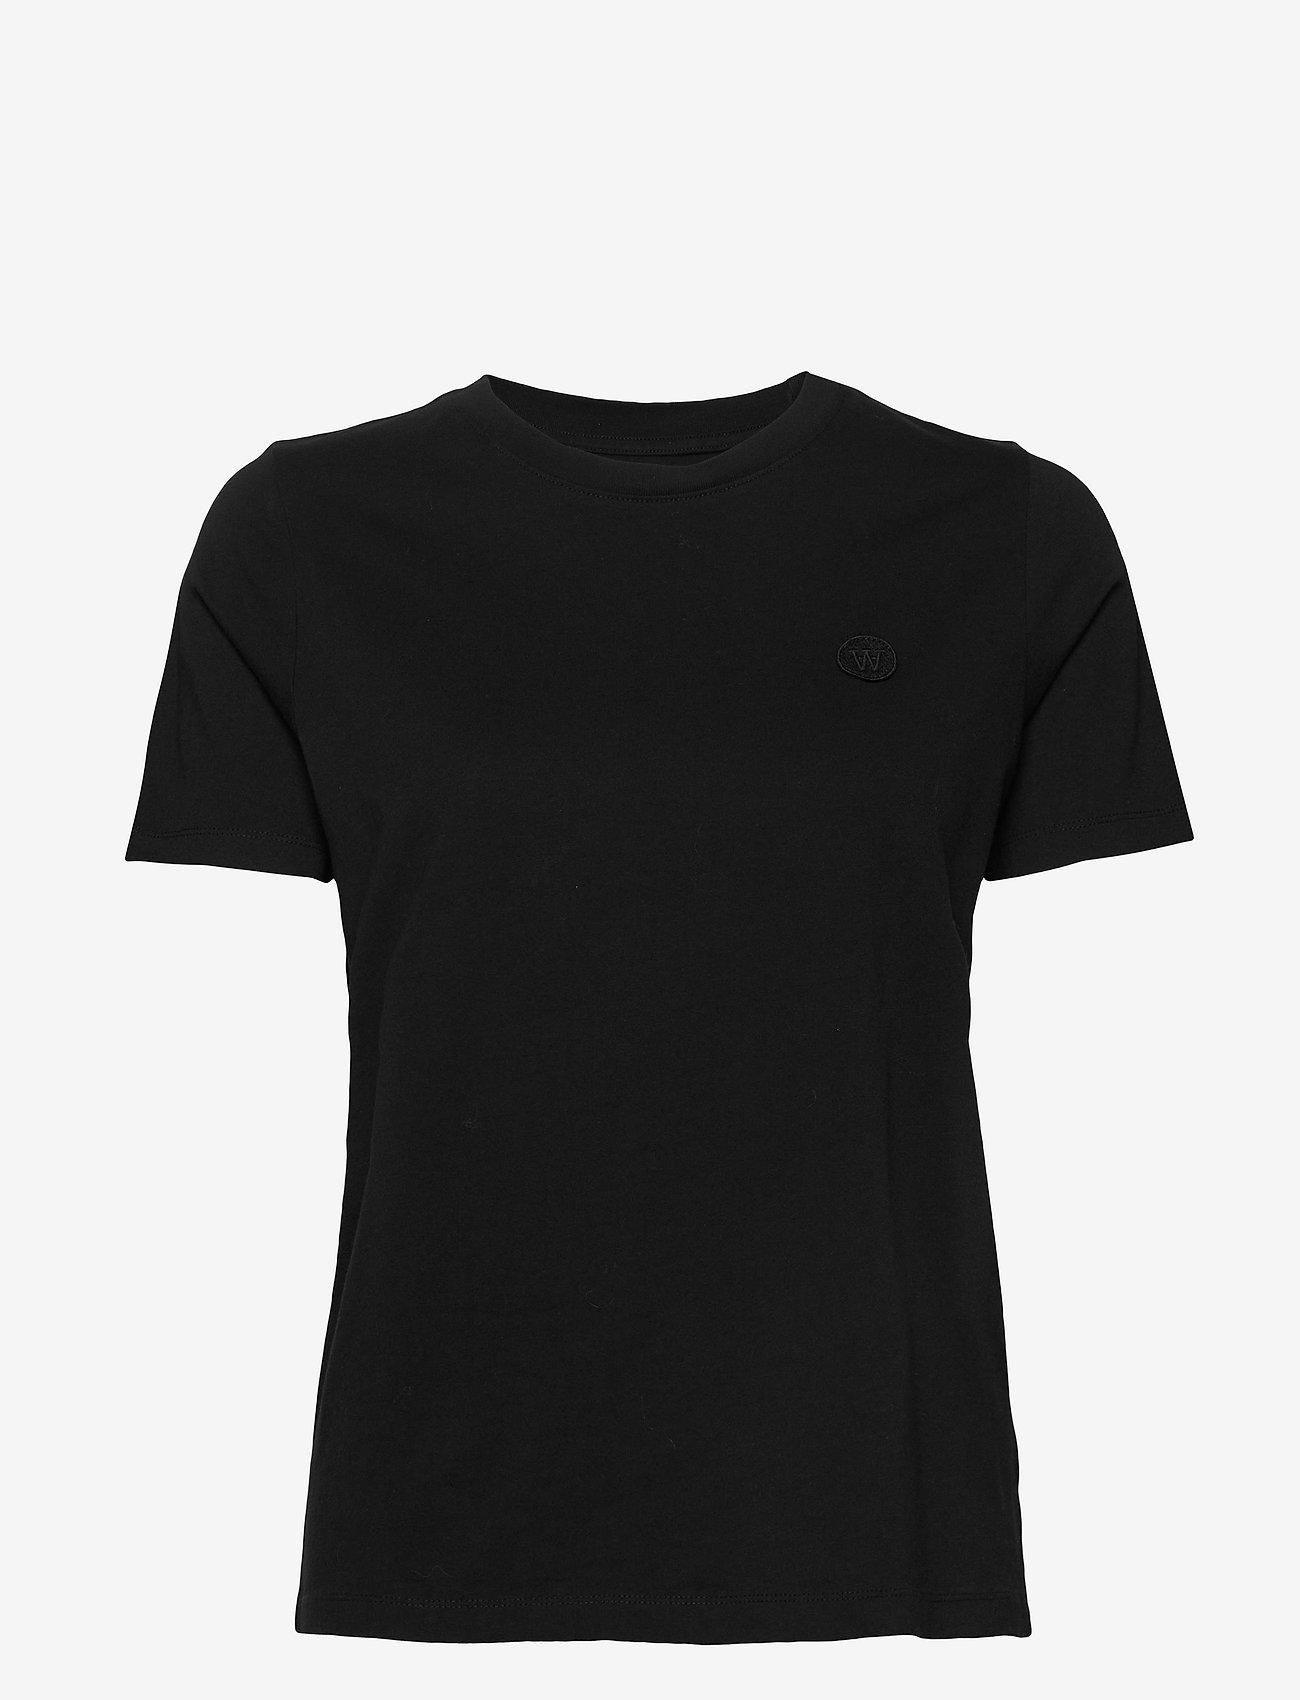 Wood Wood - Mia T-shirt - t-shirts - black - 0